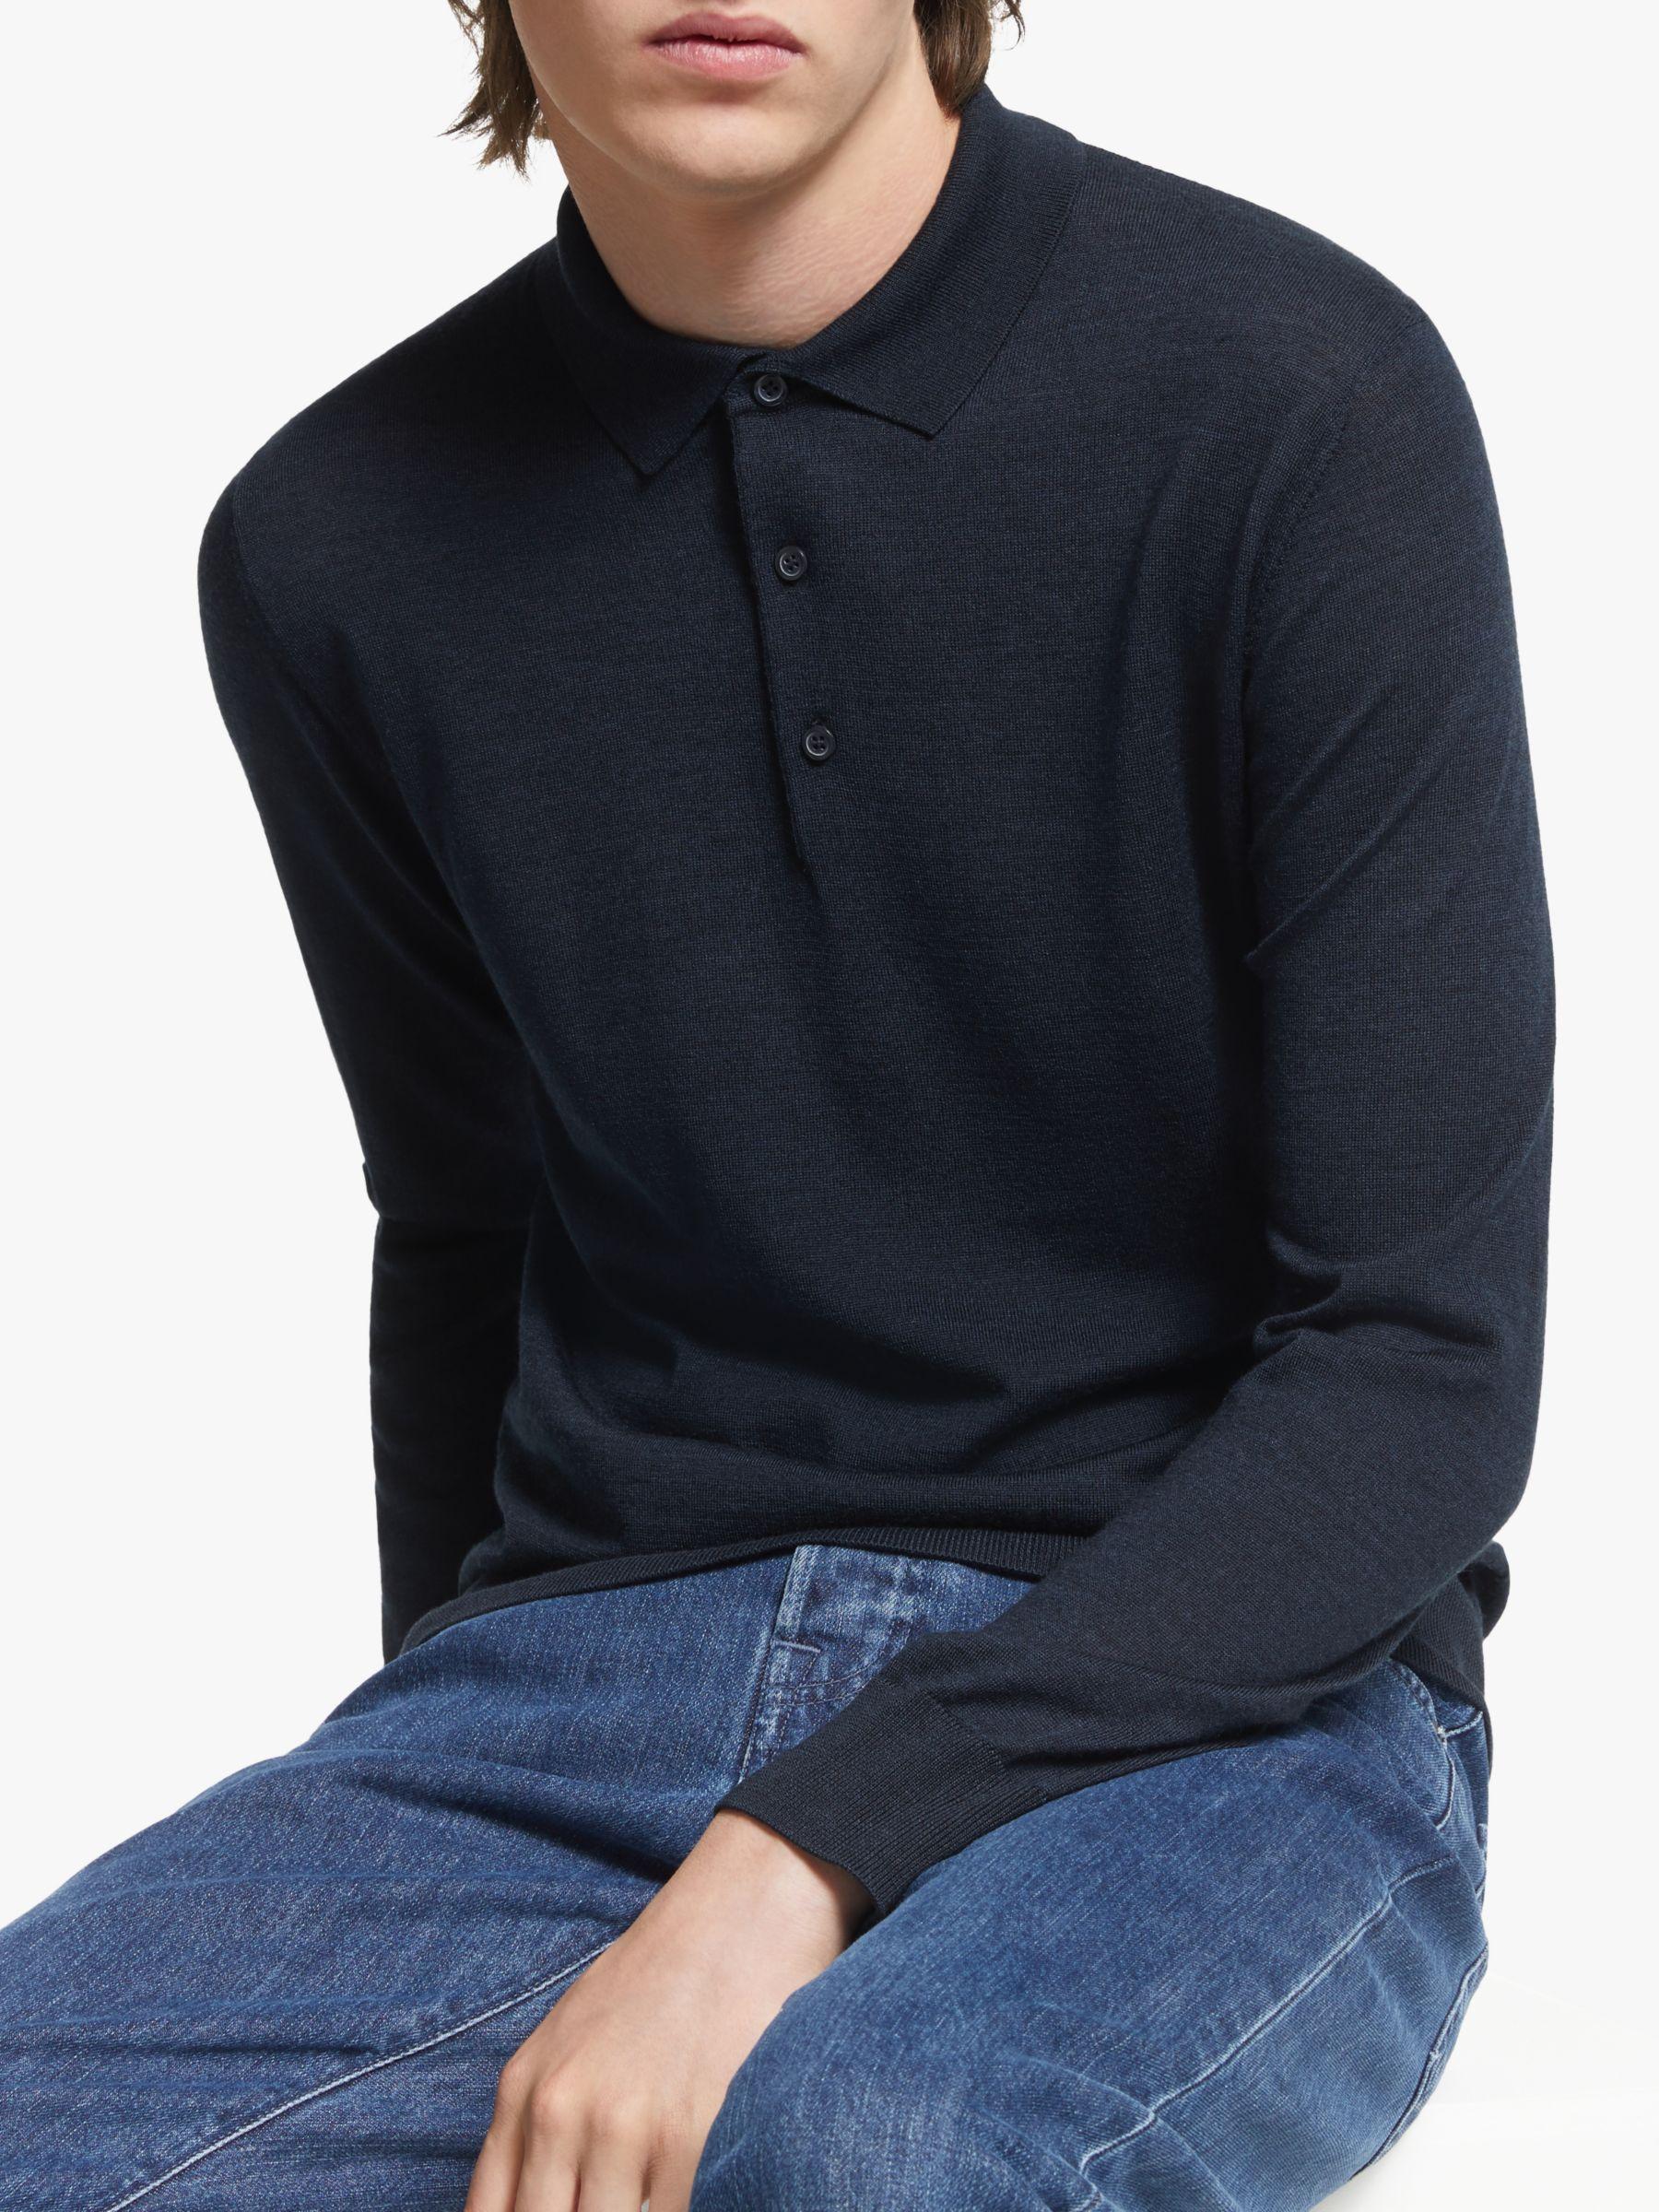 J.LINDEBERG J.Lindeberg Luciano Wool Silk Polo Shirt, JL Navy